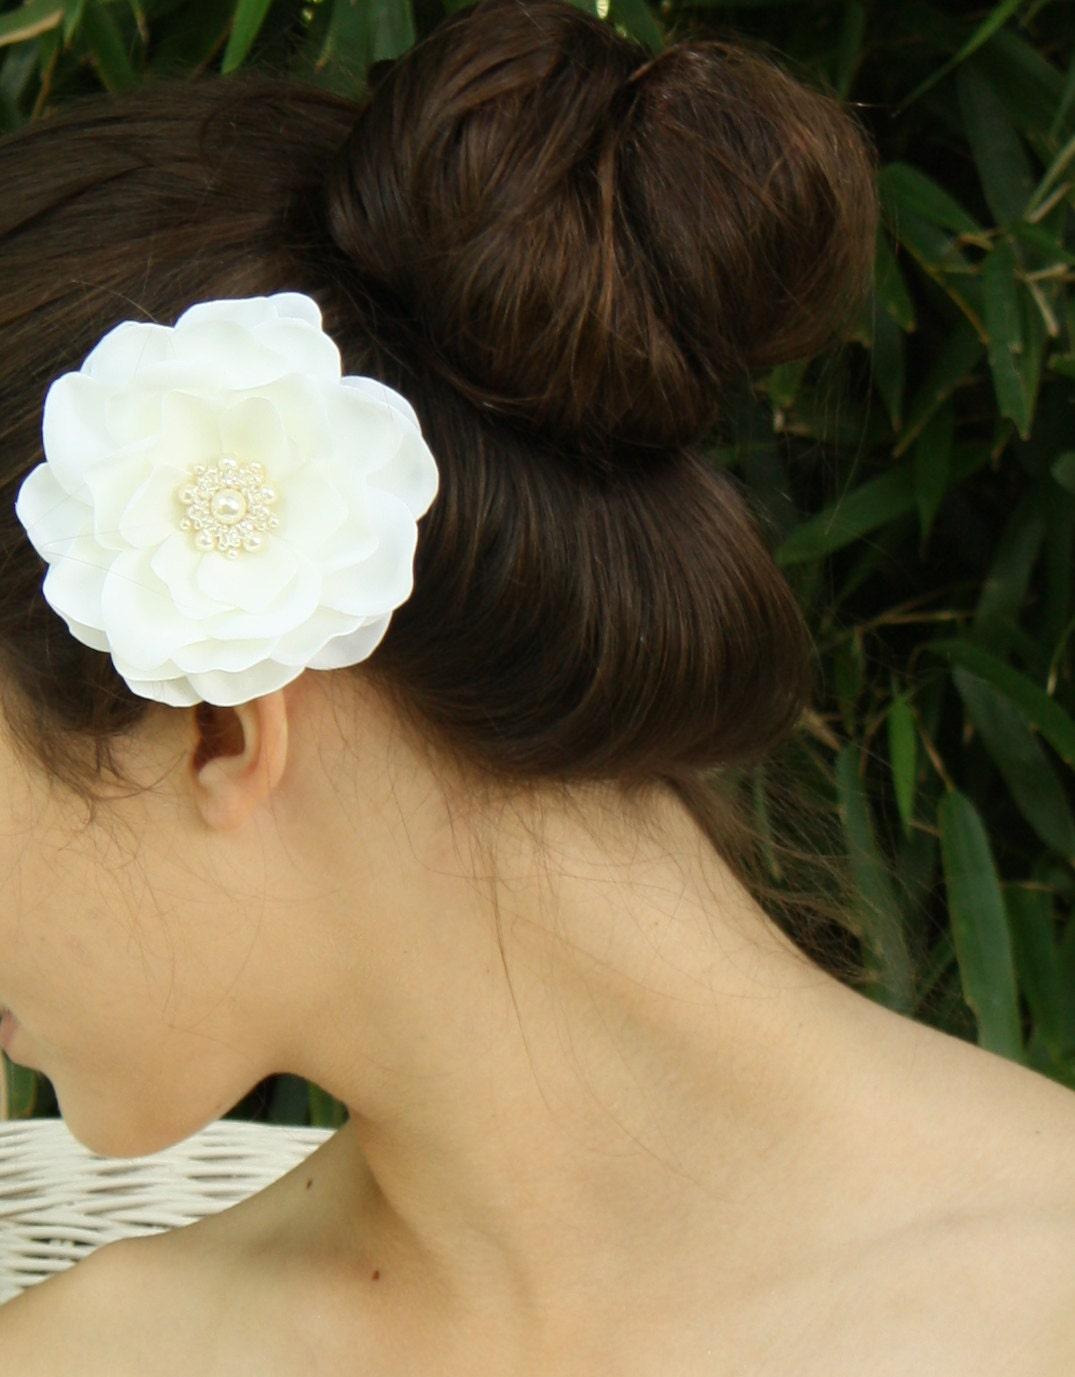 Ivory Whimsical Magnolia Bridal Hair Flower Accessory Fascinator by Virginiageigerjewels